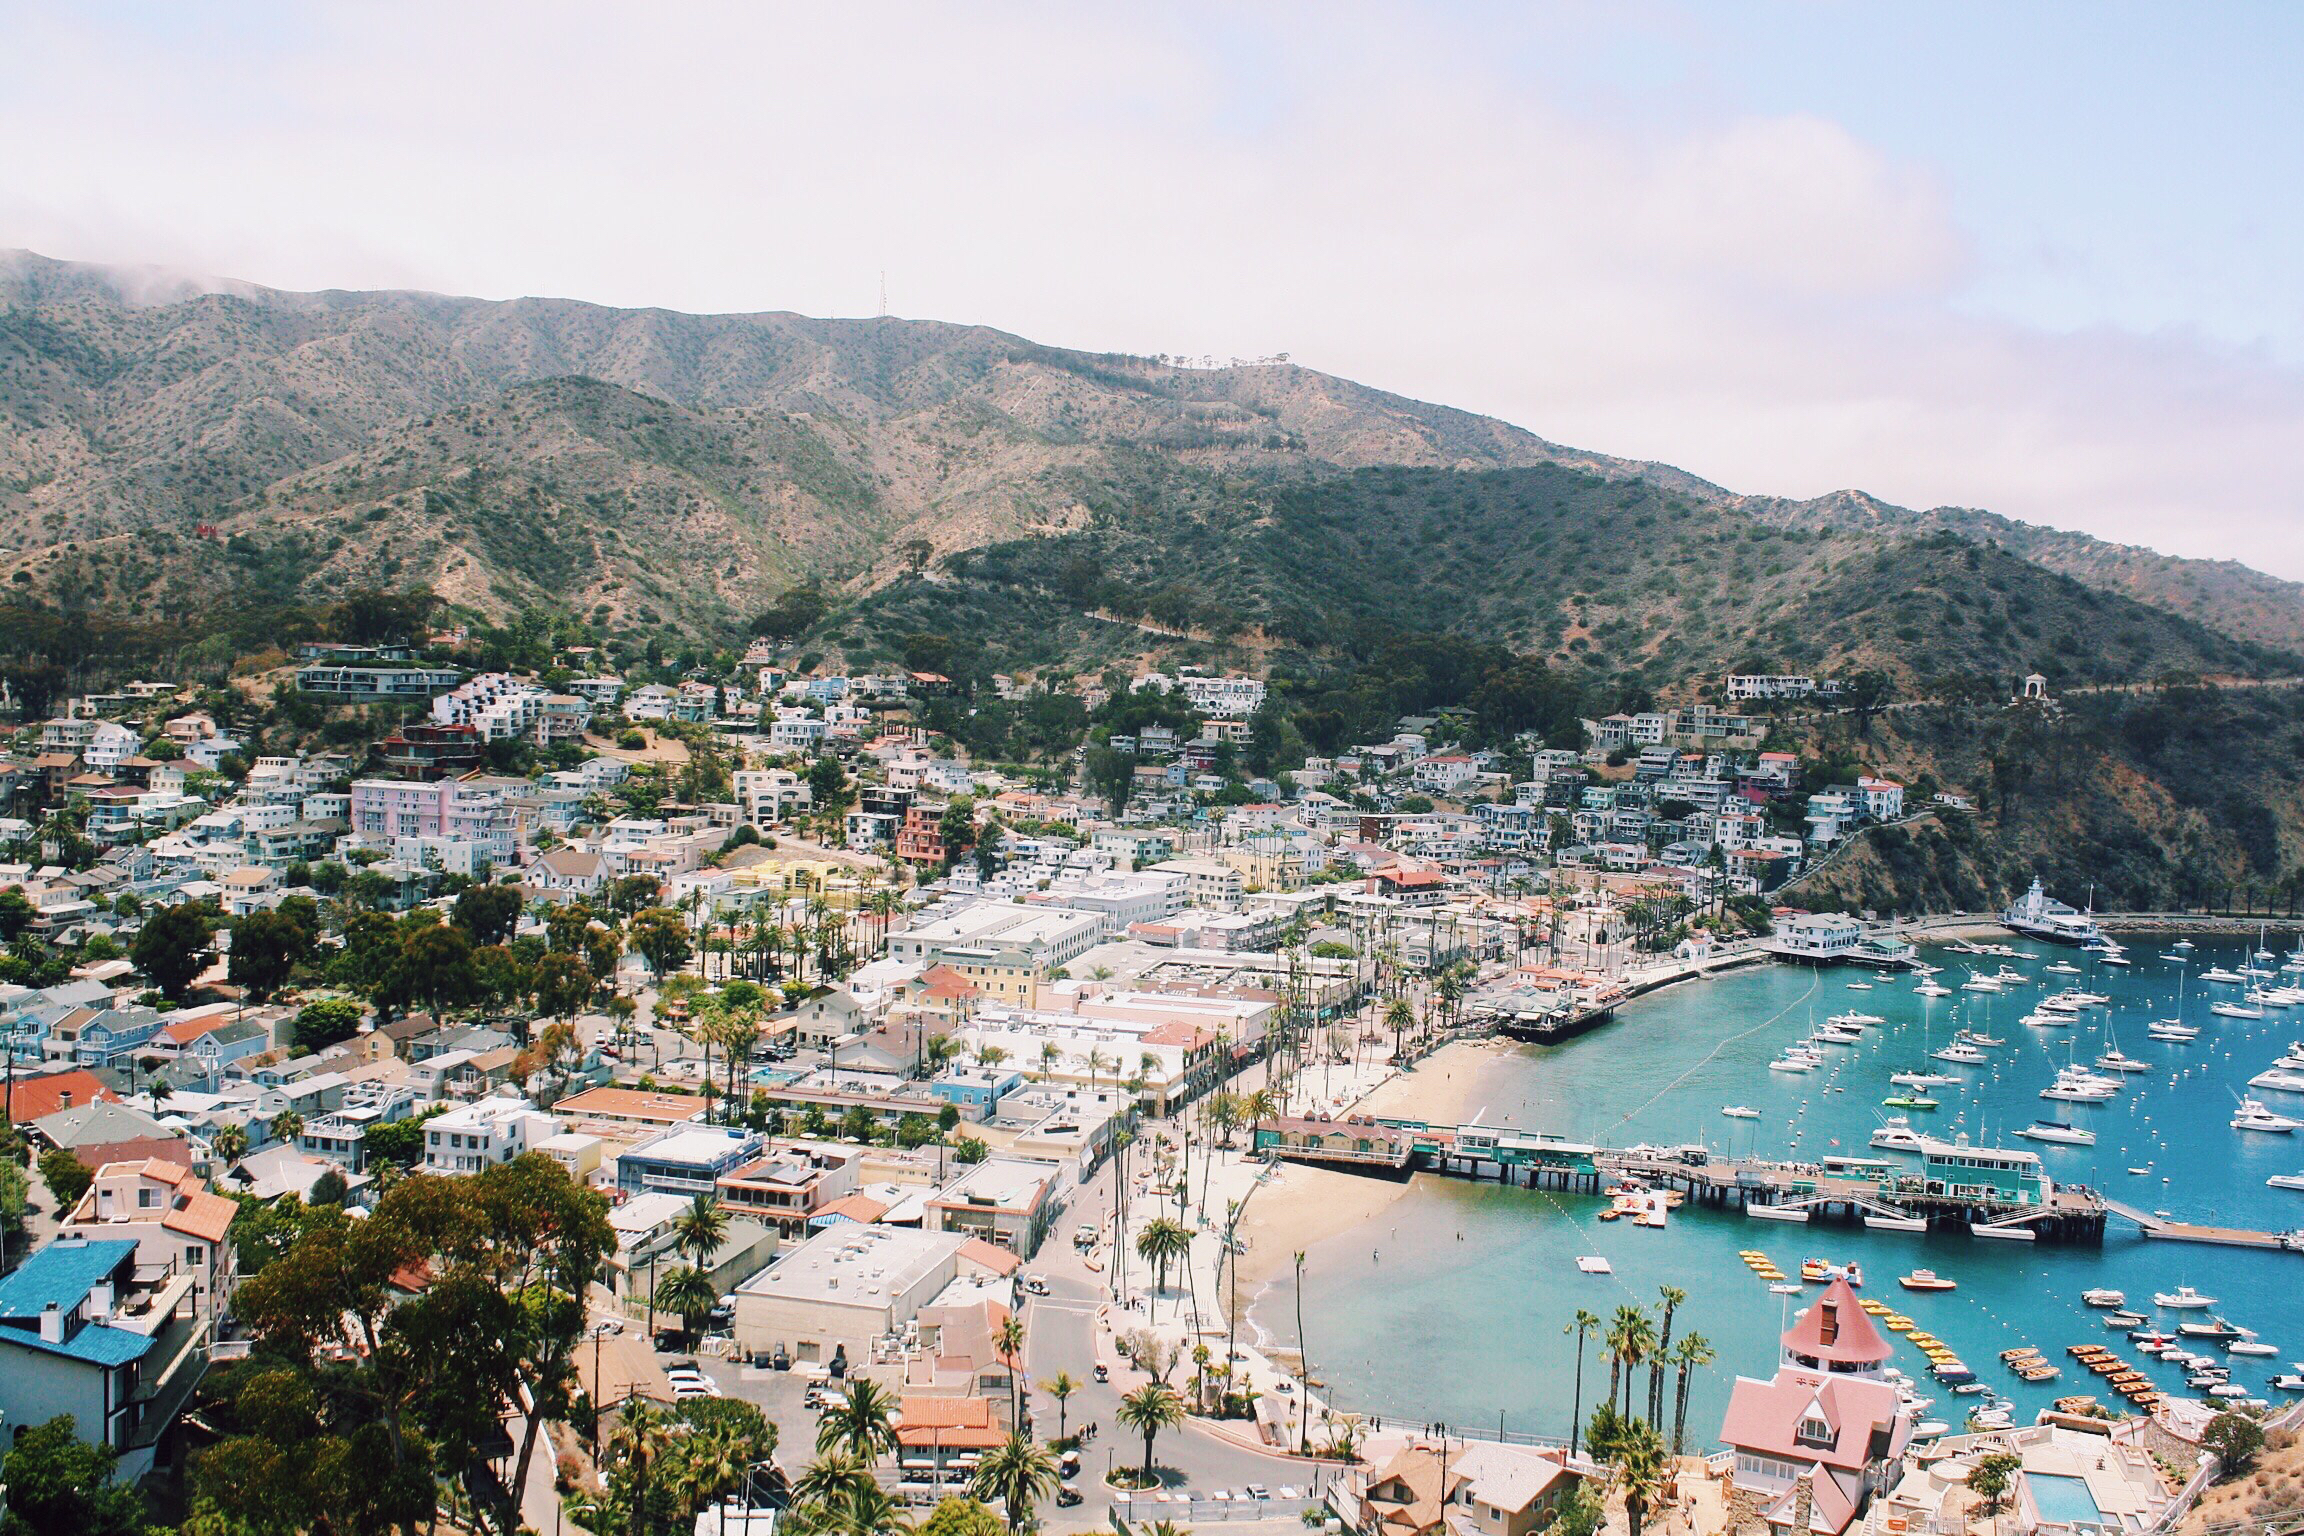 Catalina, California